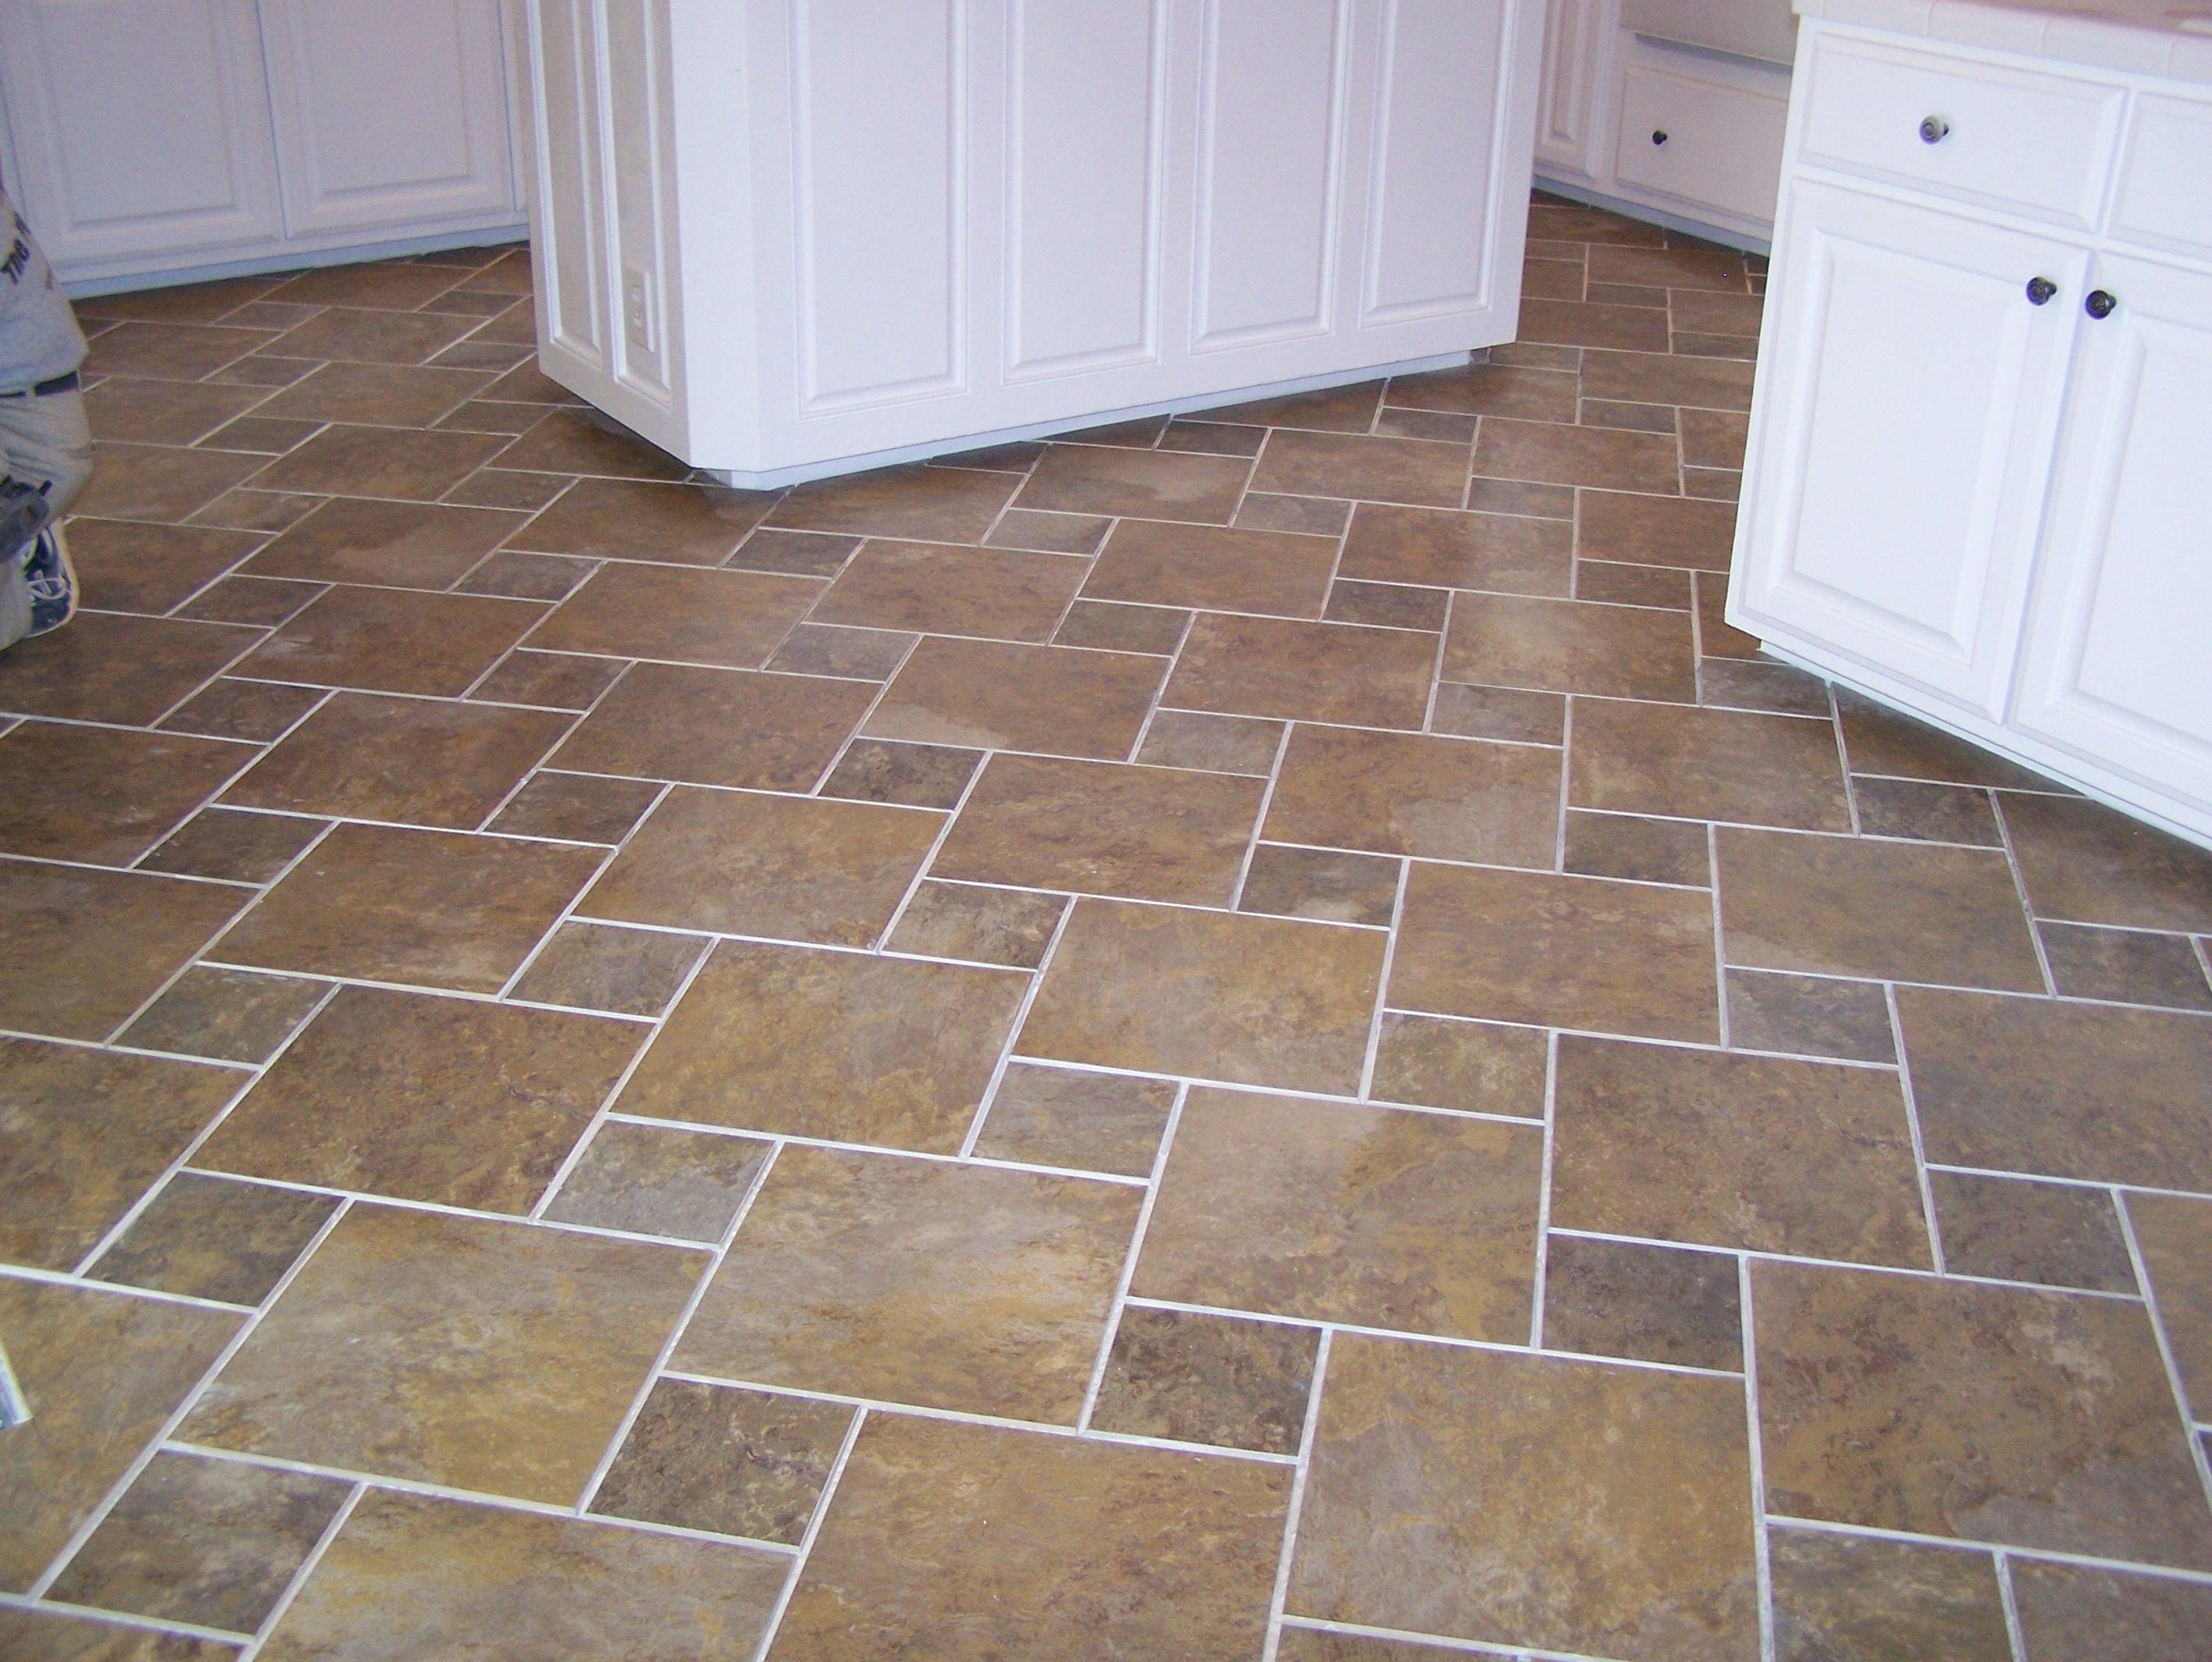 Bathroom Floor Ceramic Tile Design. bathroom floor tile design video ...